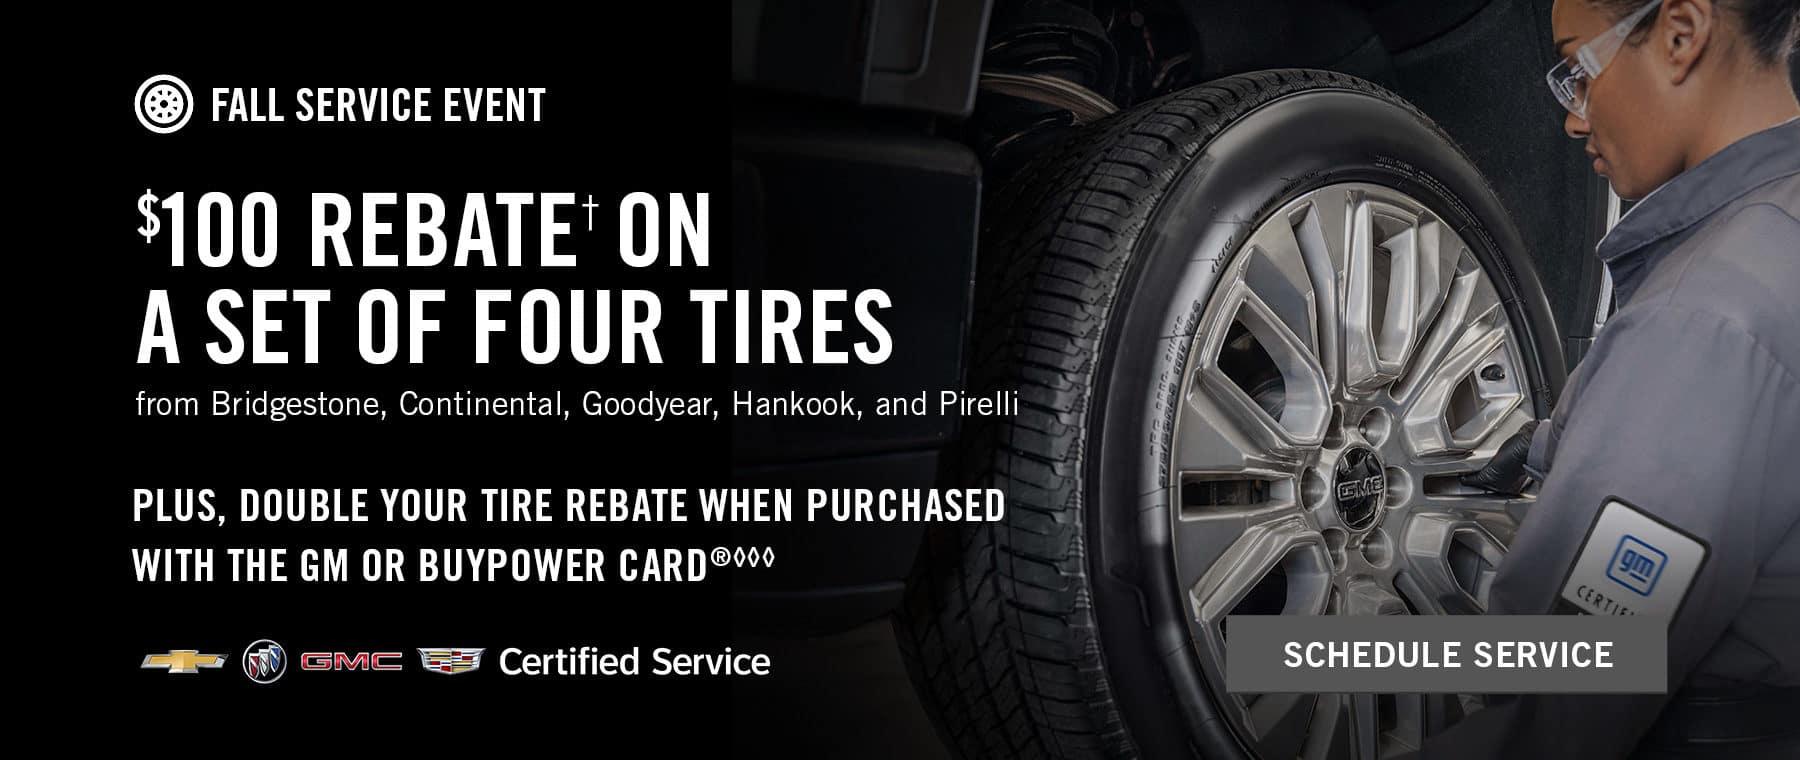 $100 Rebate on a set of four tires from bridgestone, continental, goodyear, hankook, and pirelli